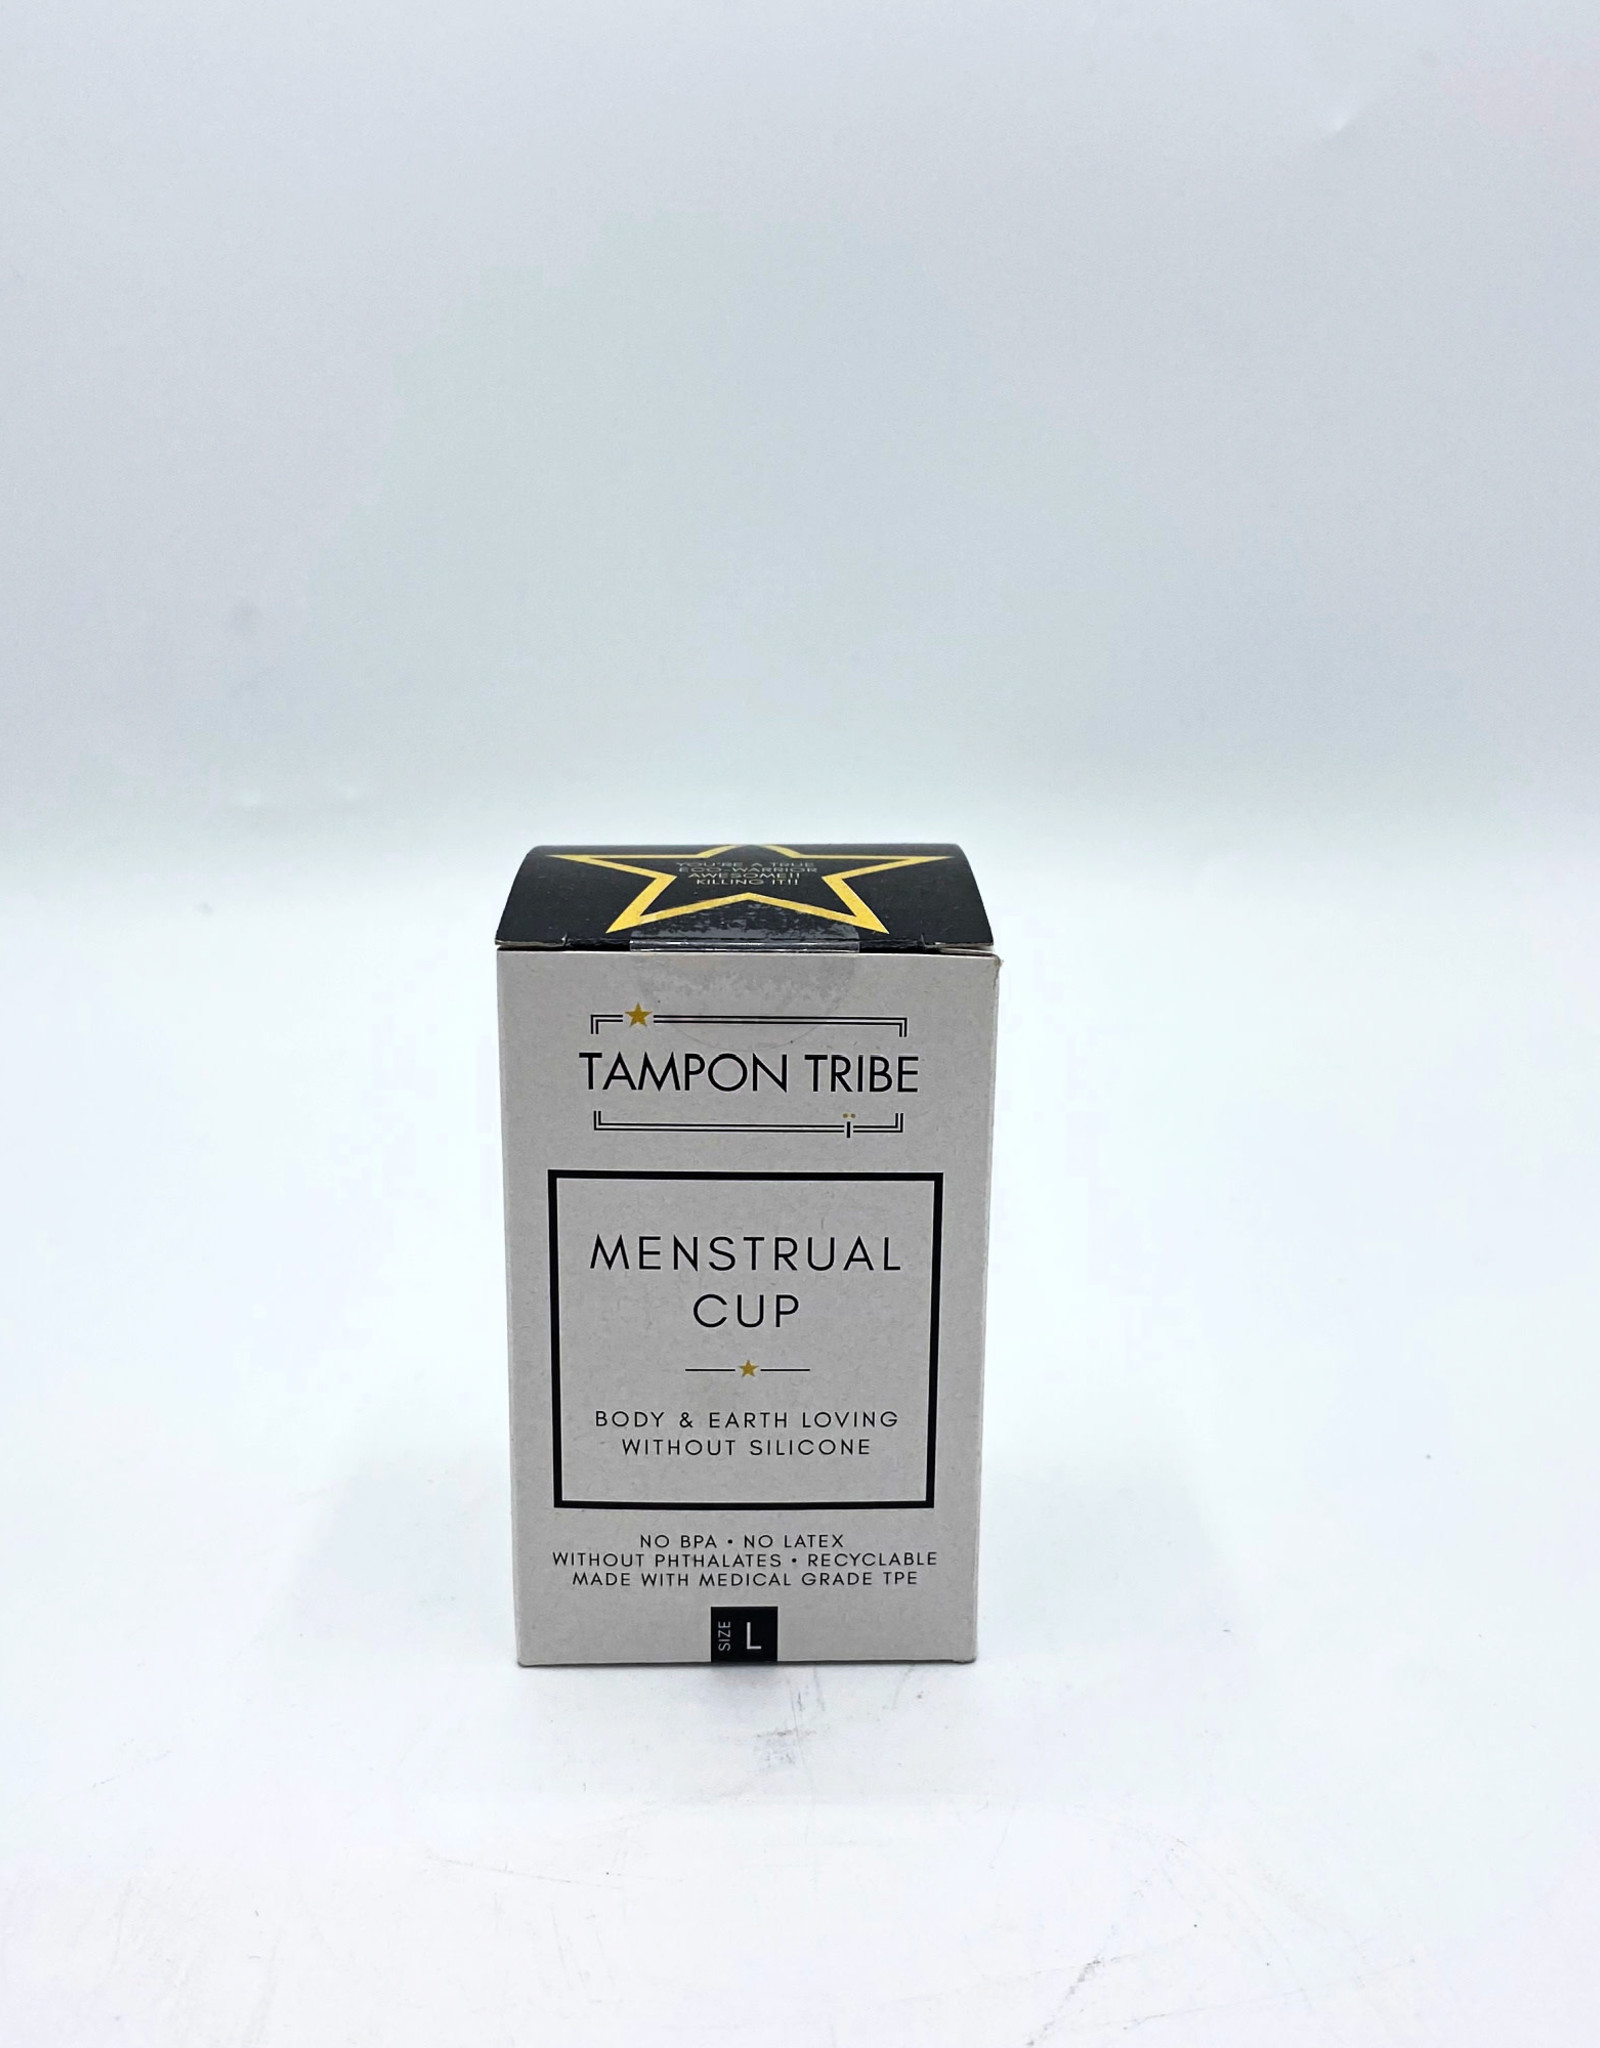 Tampon Tribe Medical Grade TPE Menstrual Cup